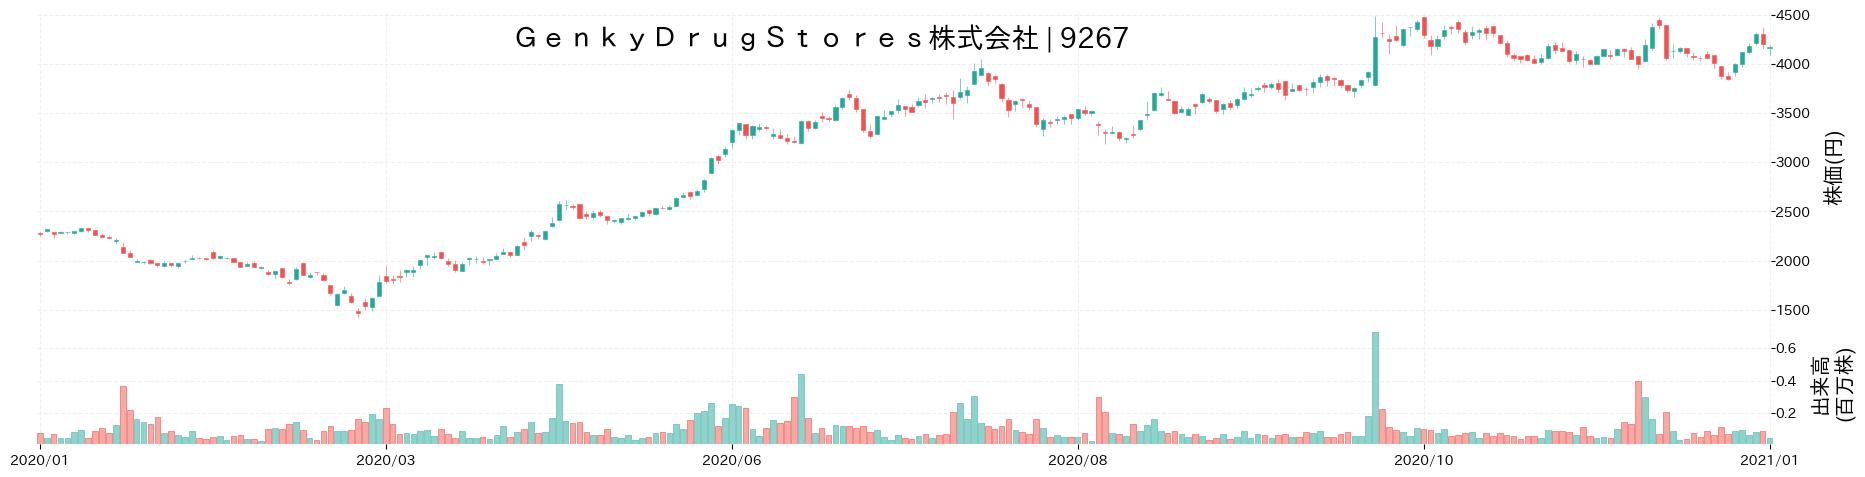 Genky DrugStores株式会社の株価推移(2020)